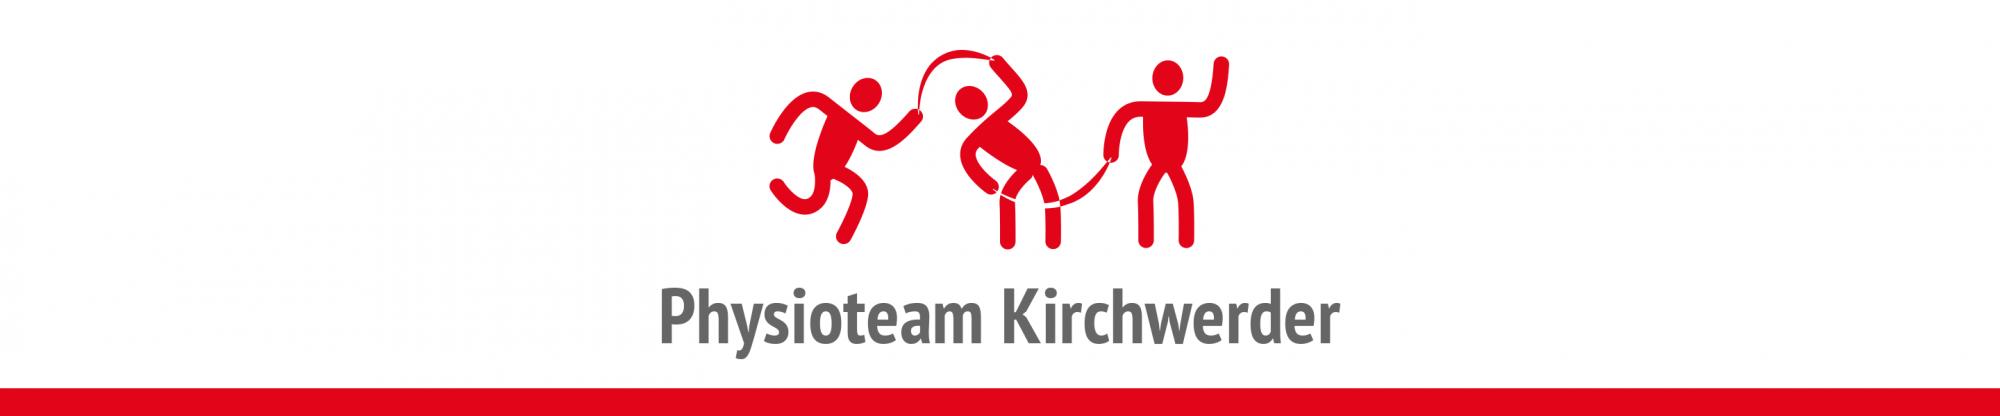 Physioteam Kirchwerder // Physiotherapie // Krankengymnastik